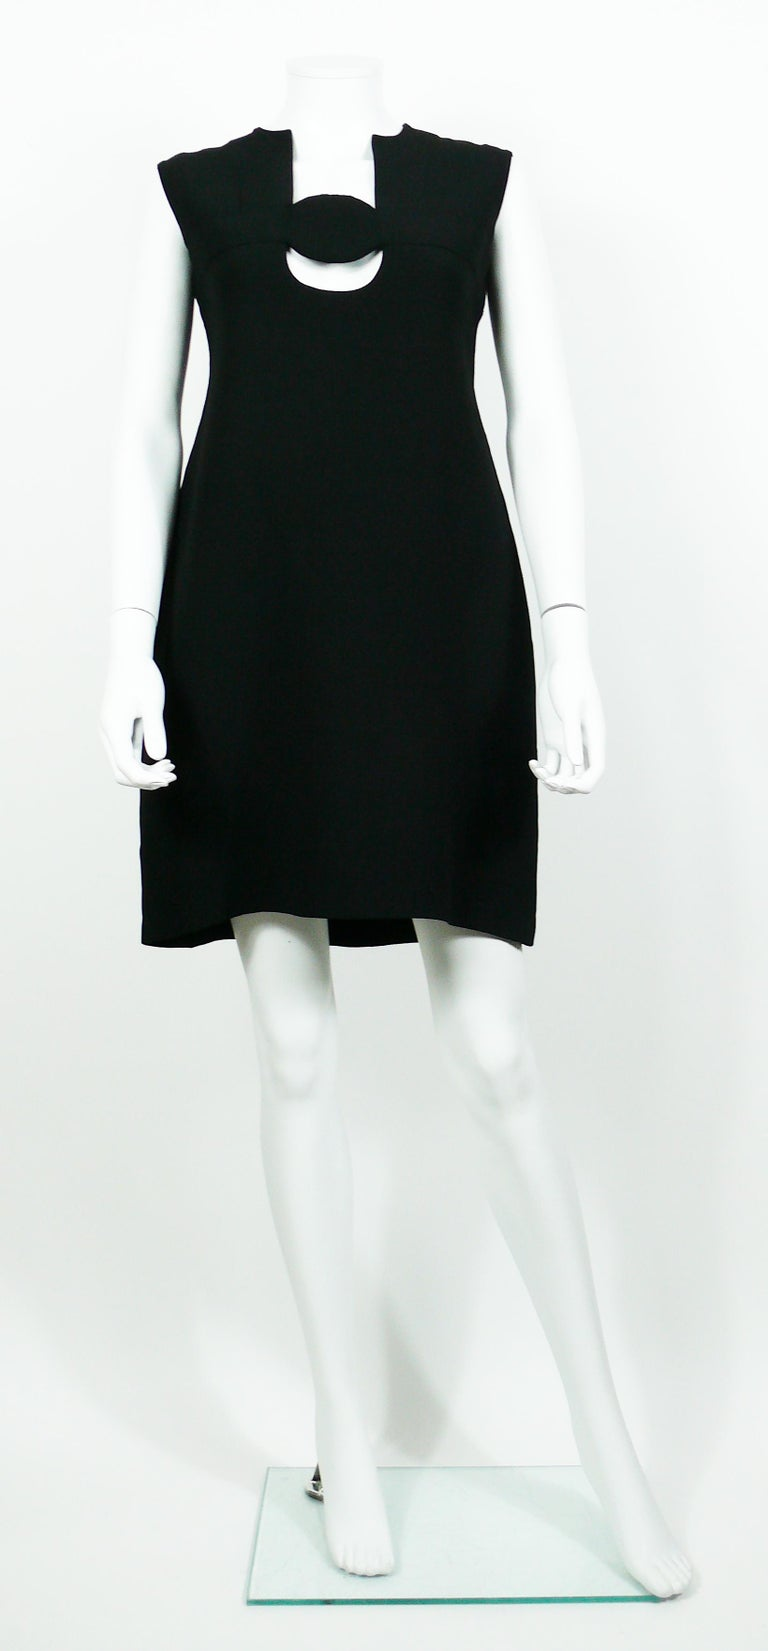 fead705e4f3 Pierre Cardin Vintage Space Age Cut Out Circle Little Black Dress In Fair  Condition For Sale